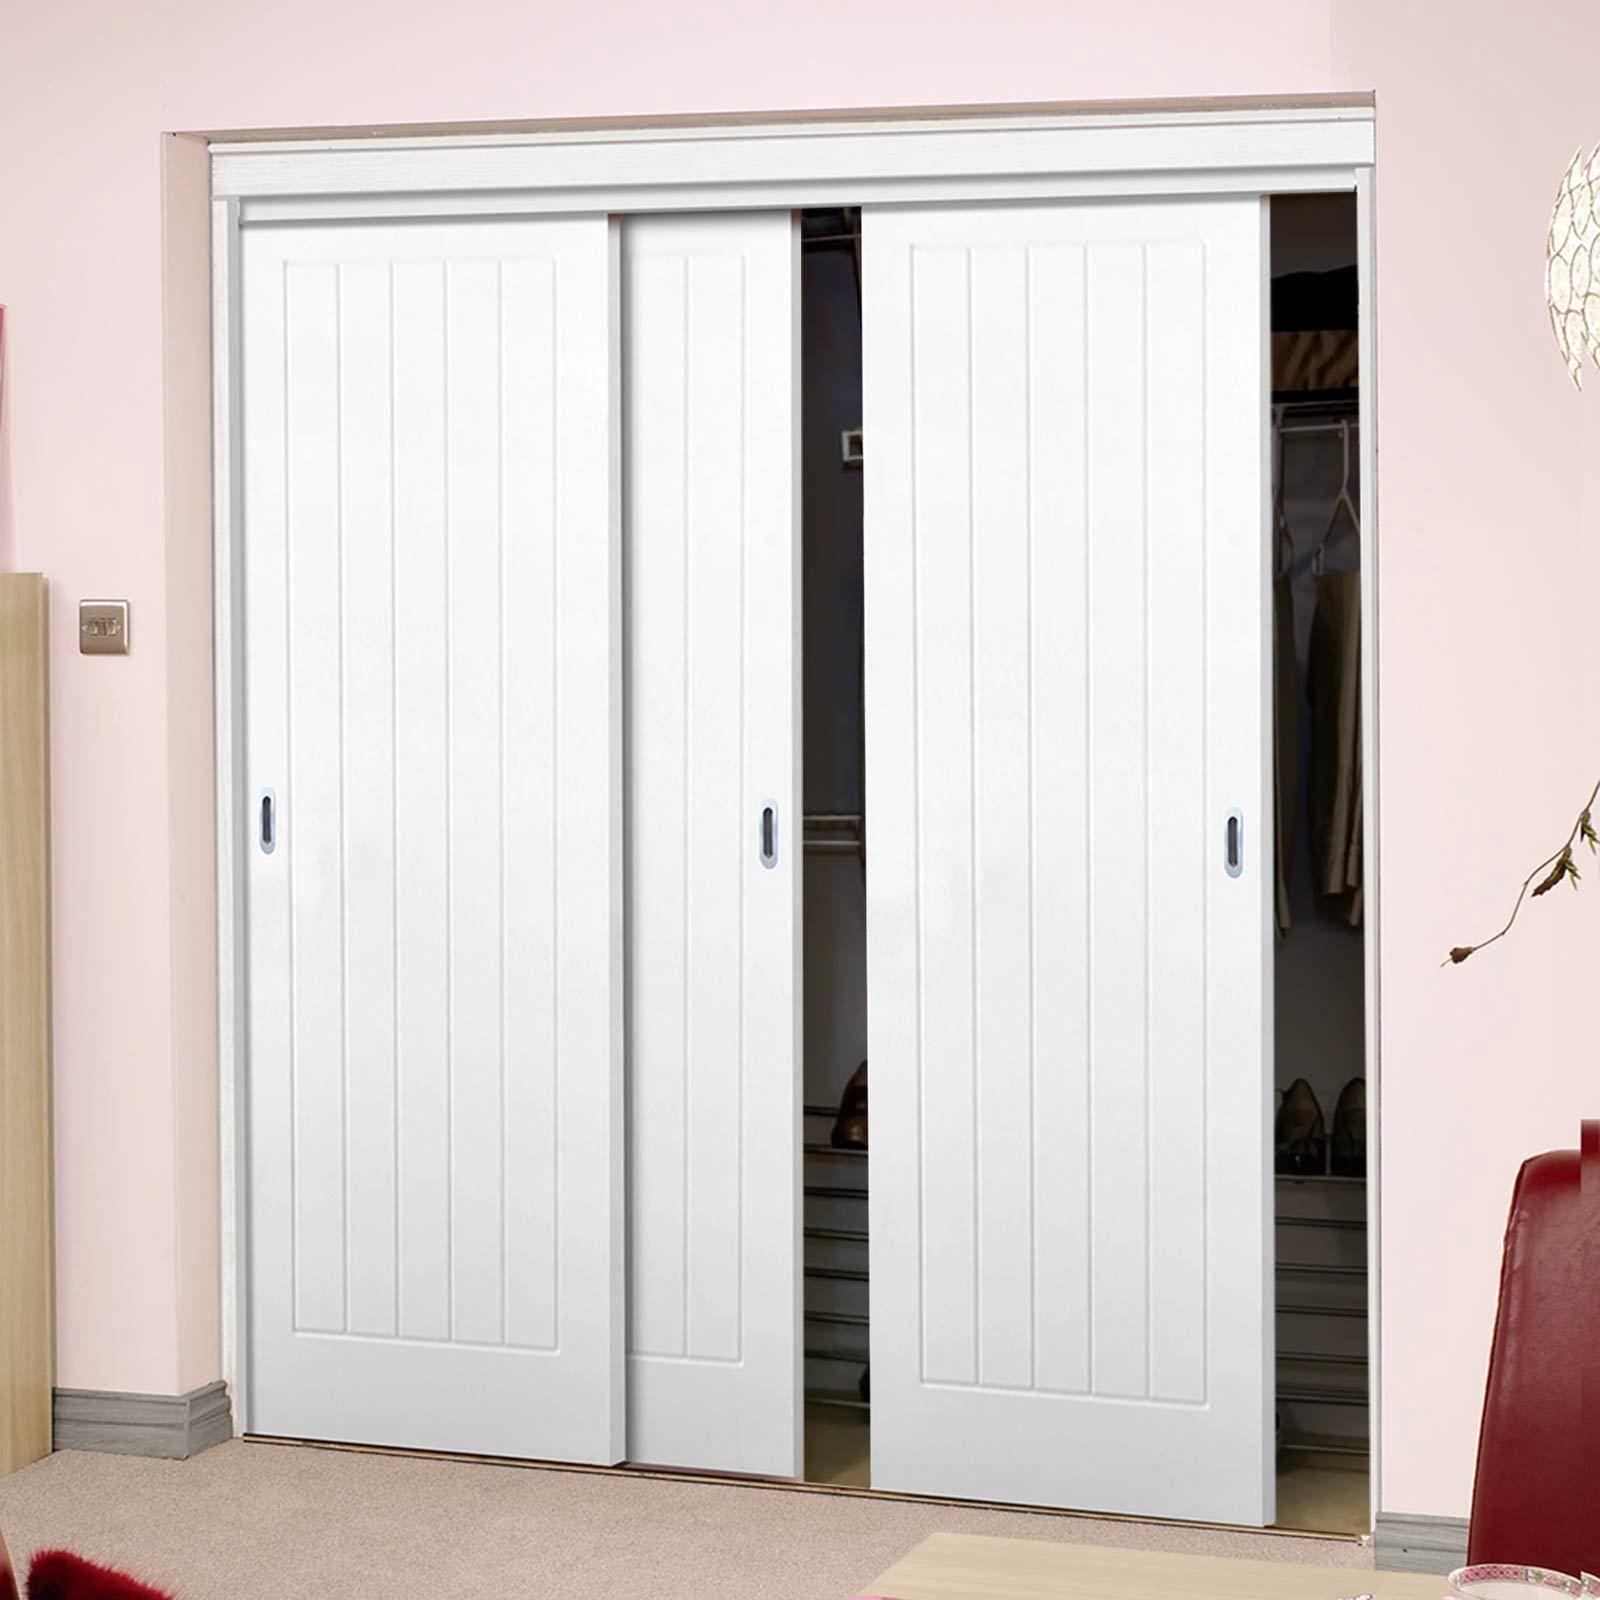 Three Sliding Wardrobe Doors Frame Kit Textured Vertical 5 Panel Wardrobedoors Whitedoors Sliding Wardrobe Doors Wardrobe Doors Sliding Wardrobe